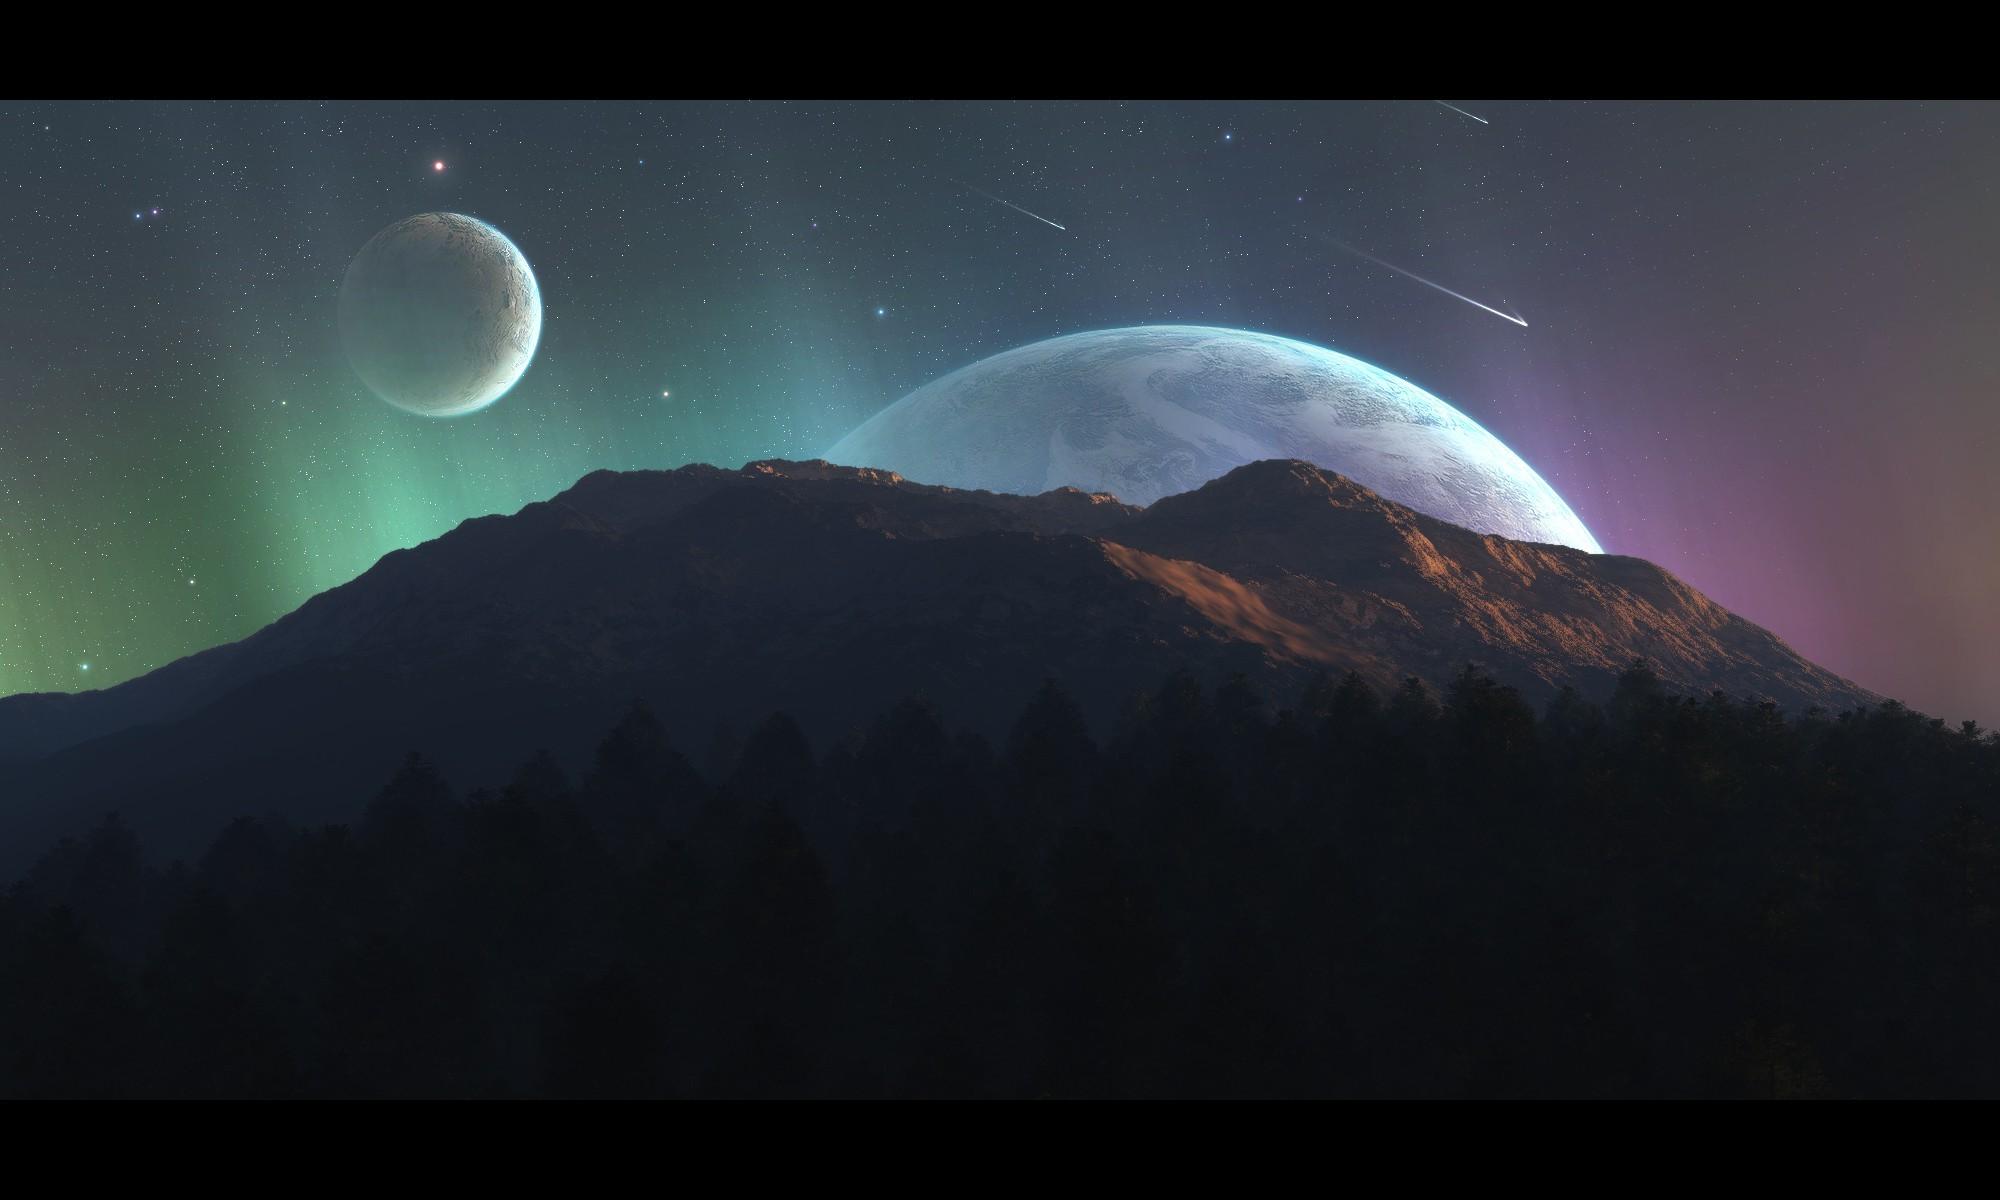 3d Home Wallpaper For Pc Digital Art Space Art Planet Landscape Wallpapers Hd